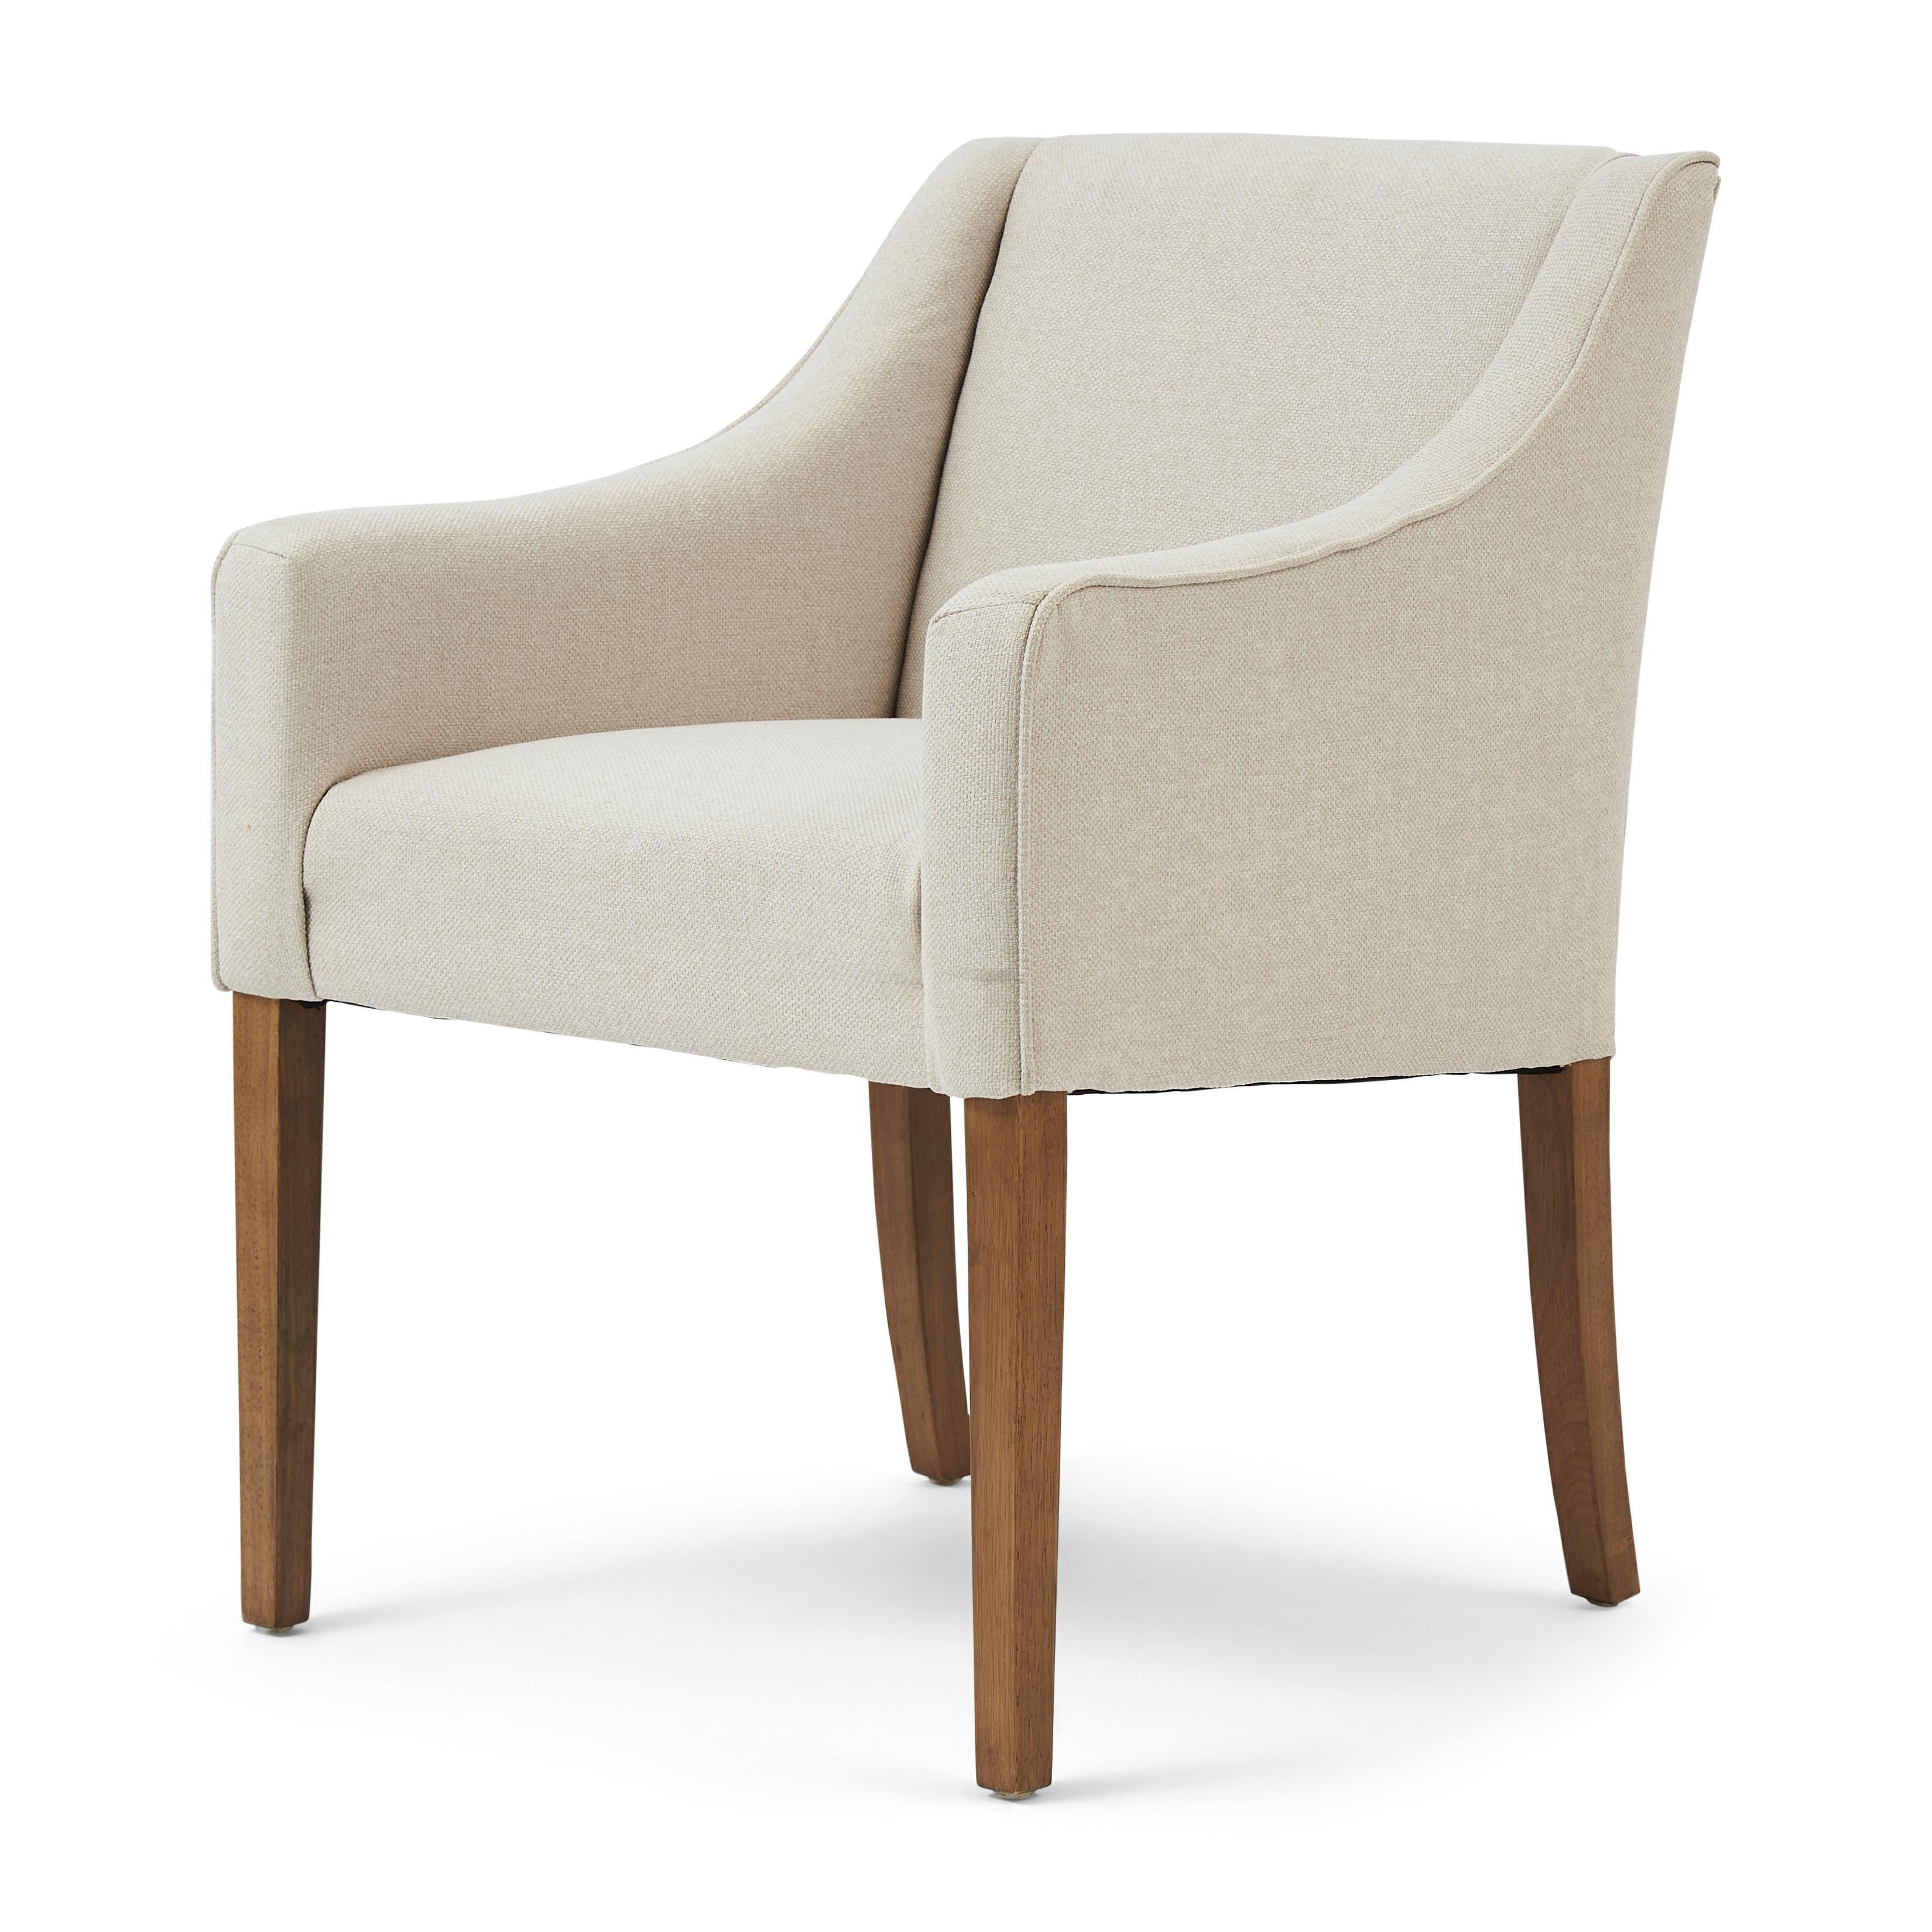 Savile Row Dining Arm Chair oxford weave flanders flax / Rivièra Maison